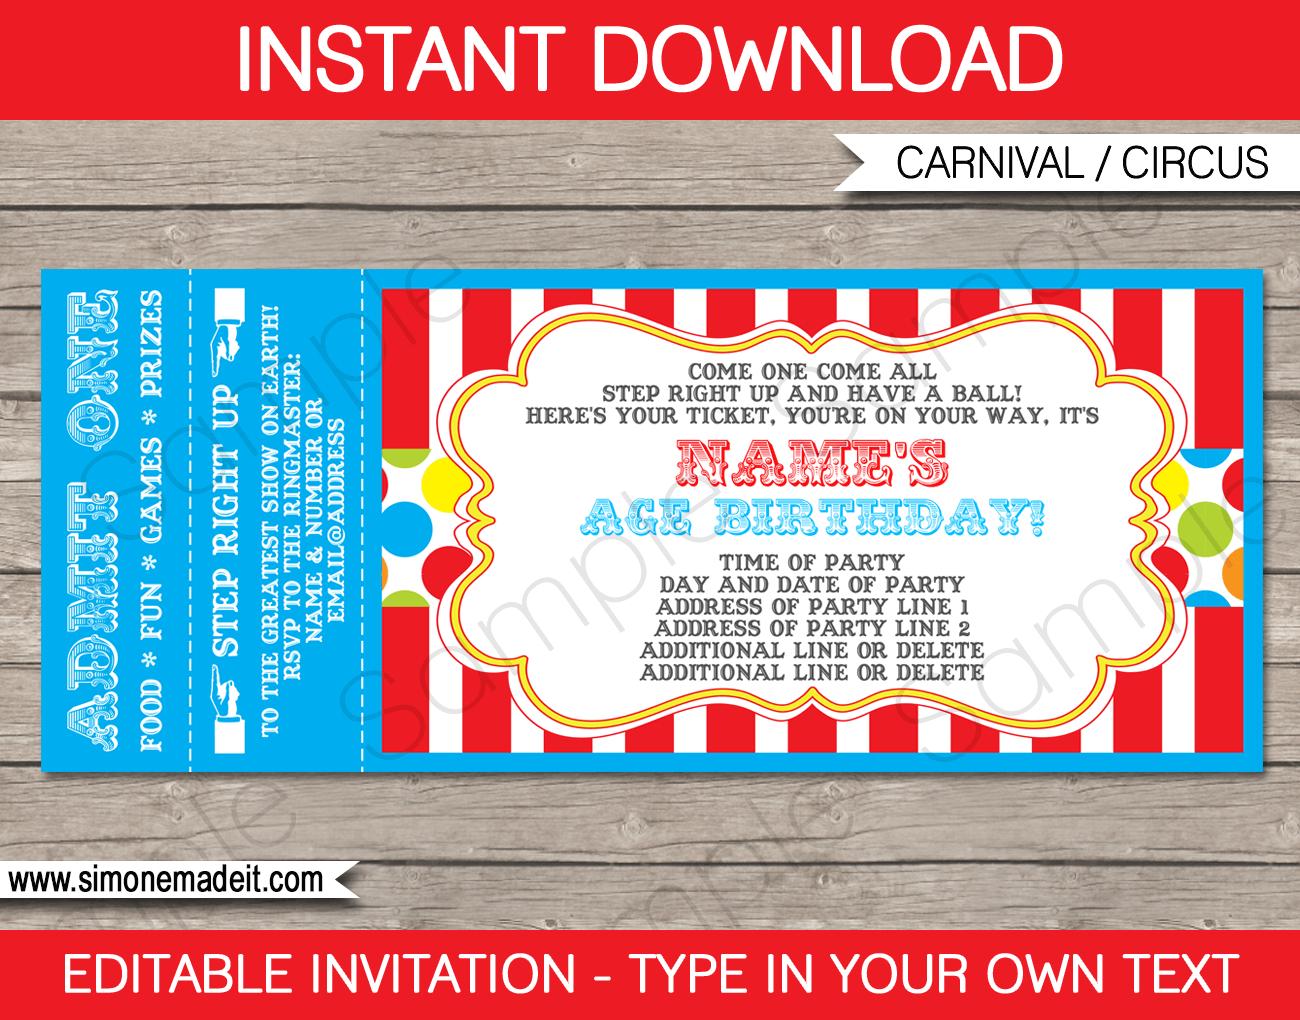 Ticket Invitation Maker - Kaza.psstech.co - Free Printable Ticket Invitation Templates